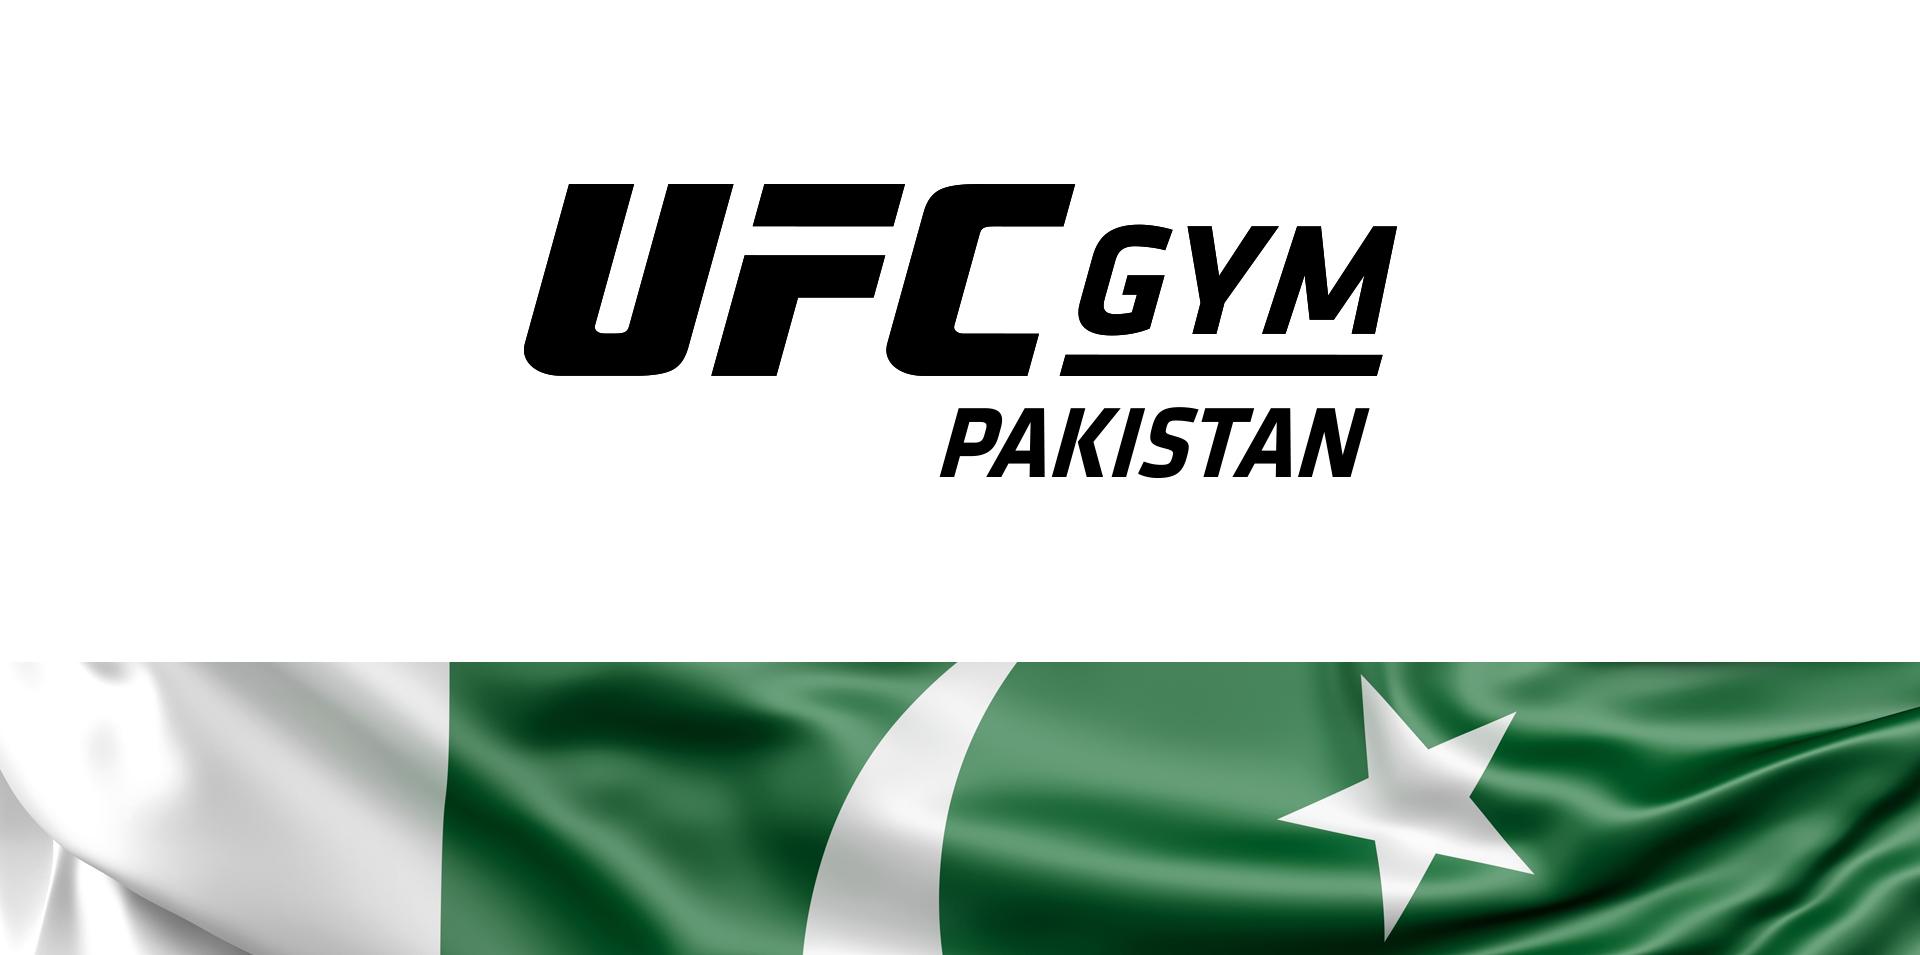 Pakistan Featured Image